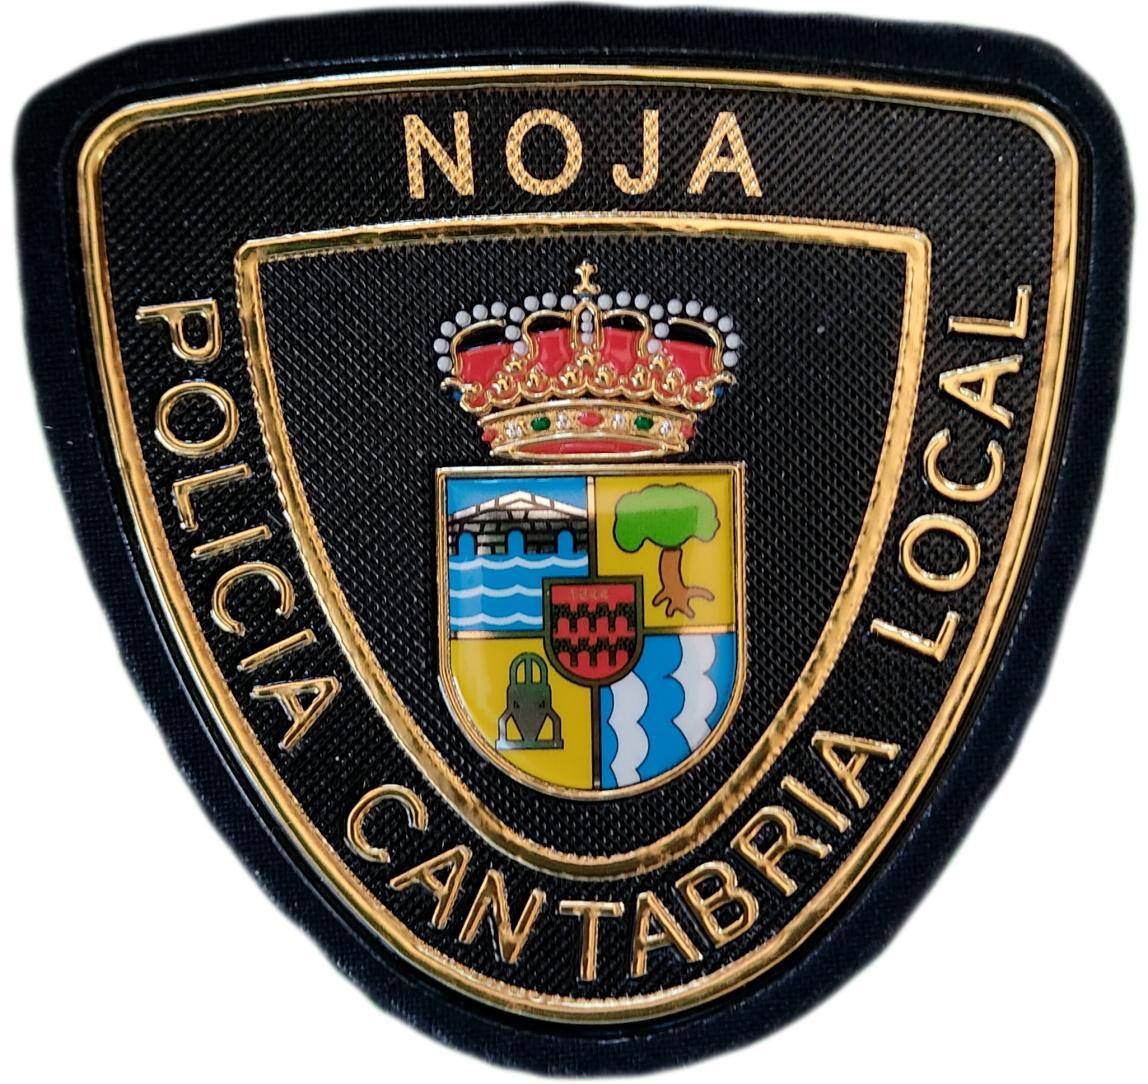 Policía Local Noja Cantabria parche insignia emblema distintivo